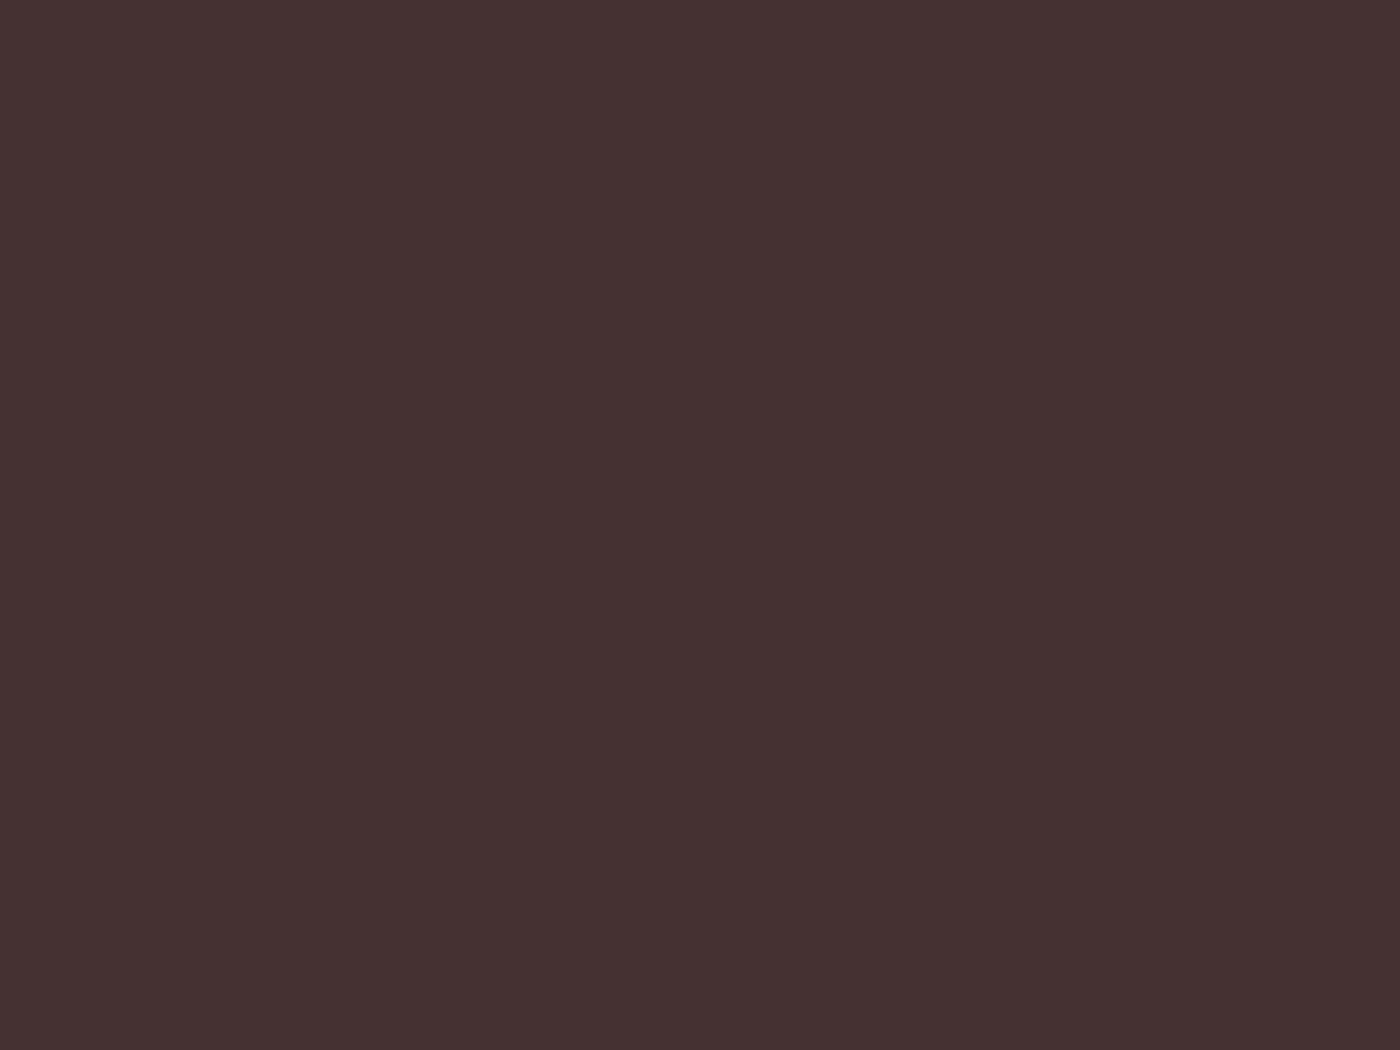 1400x1050 Old Burgundy Solid Color Background